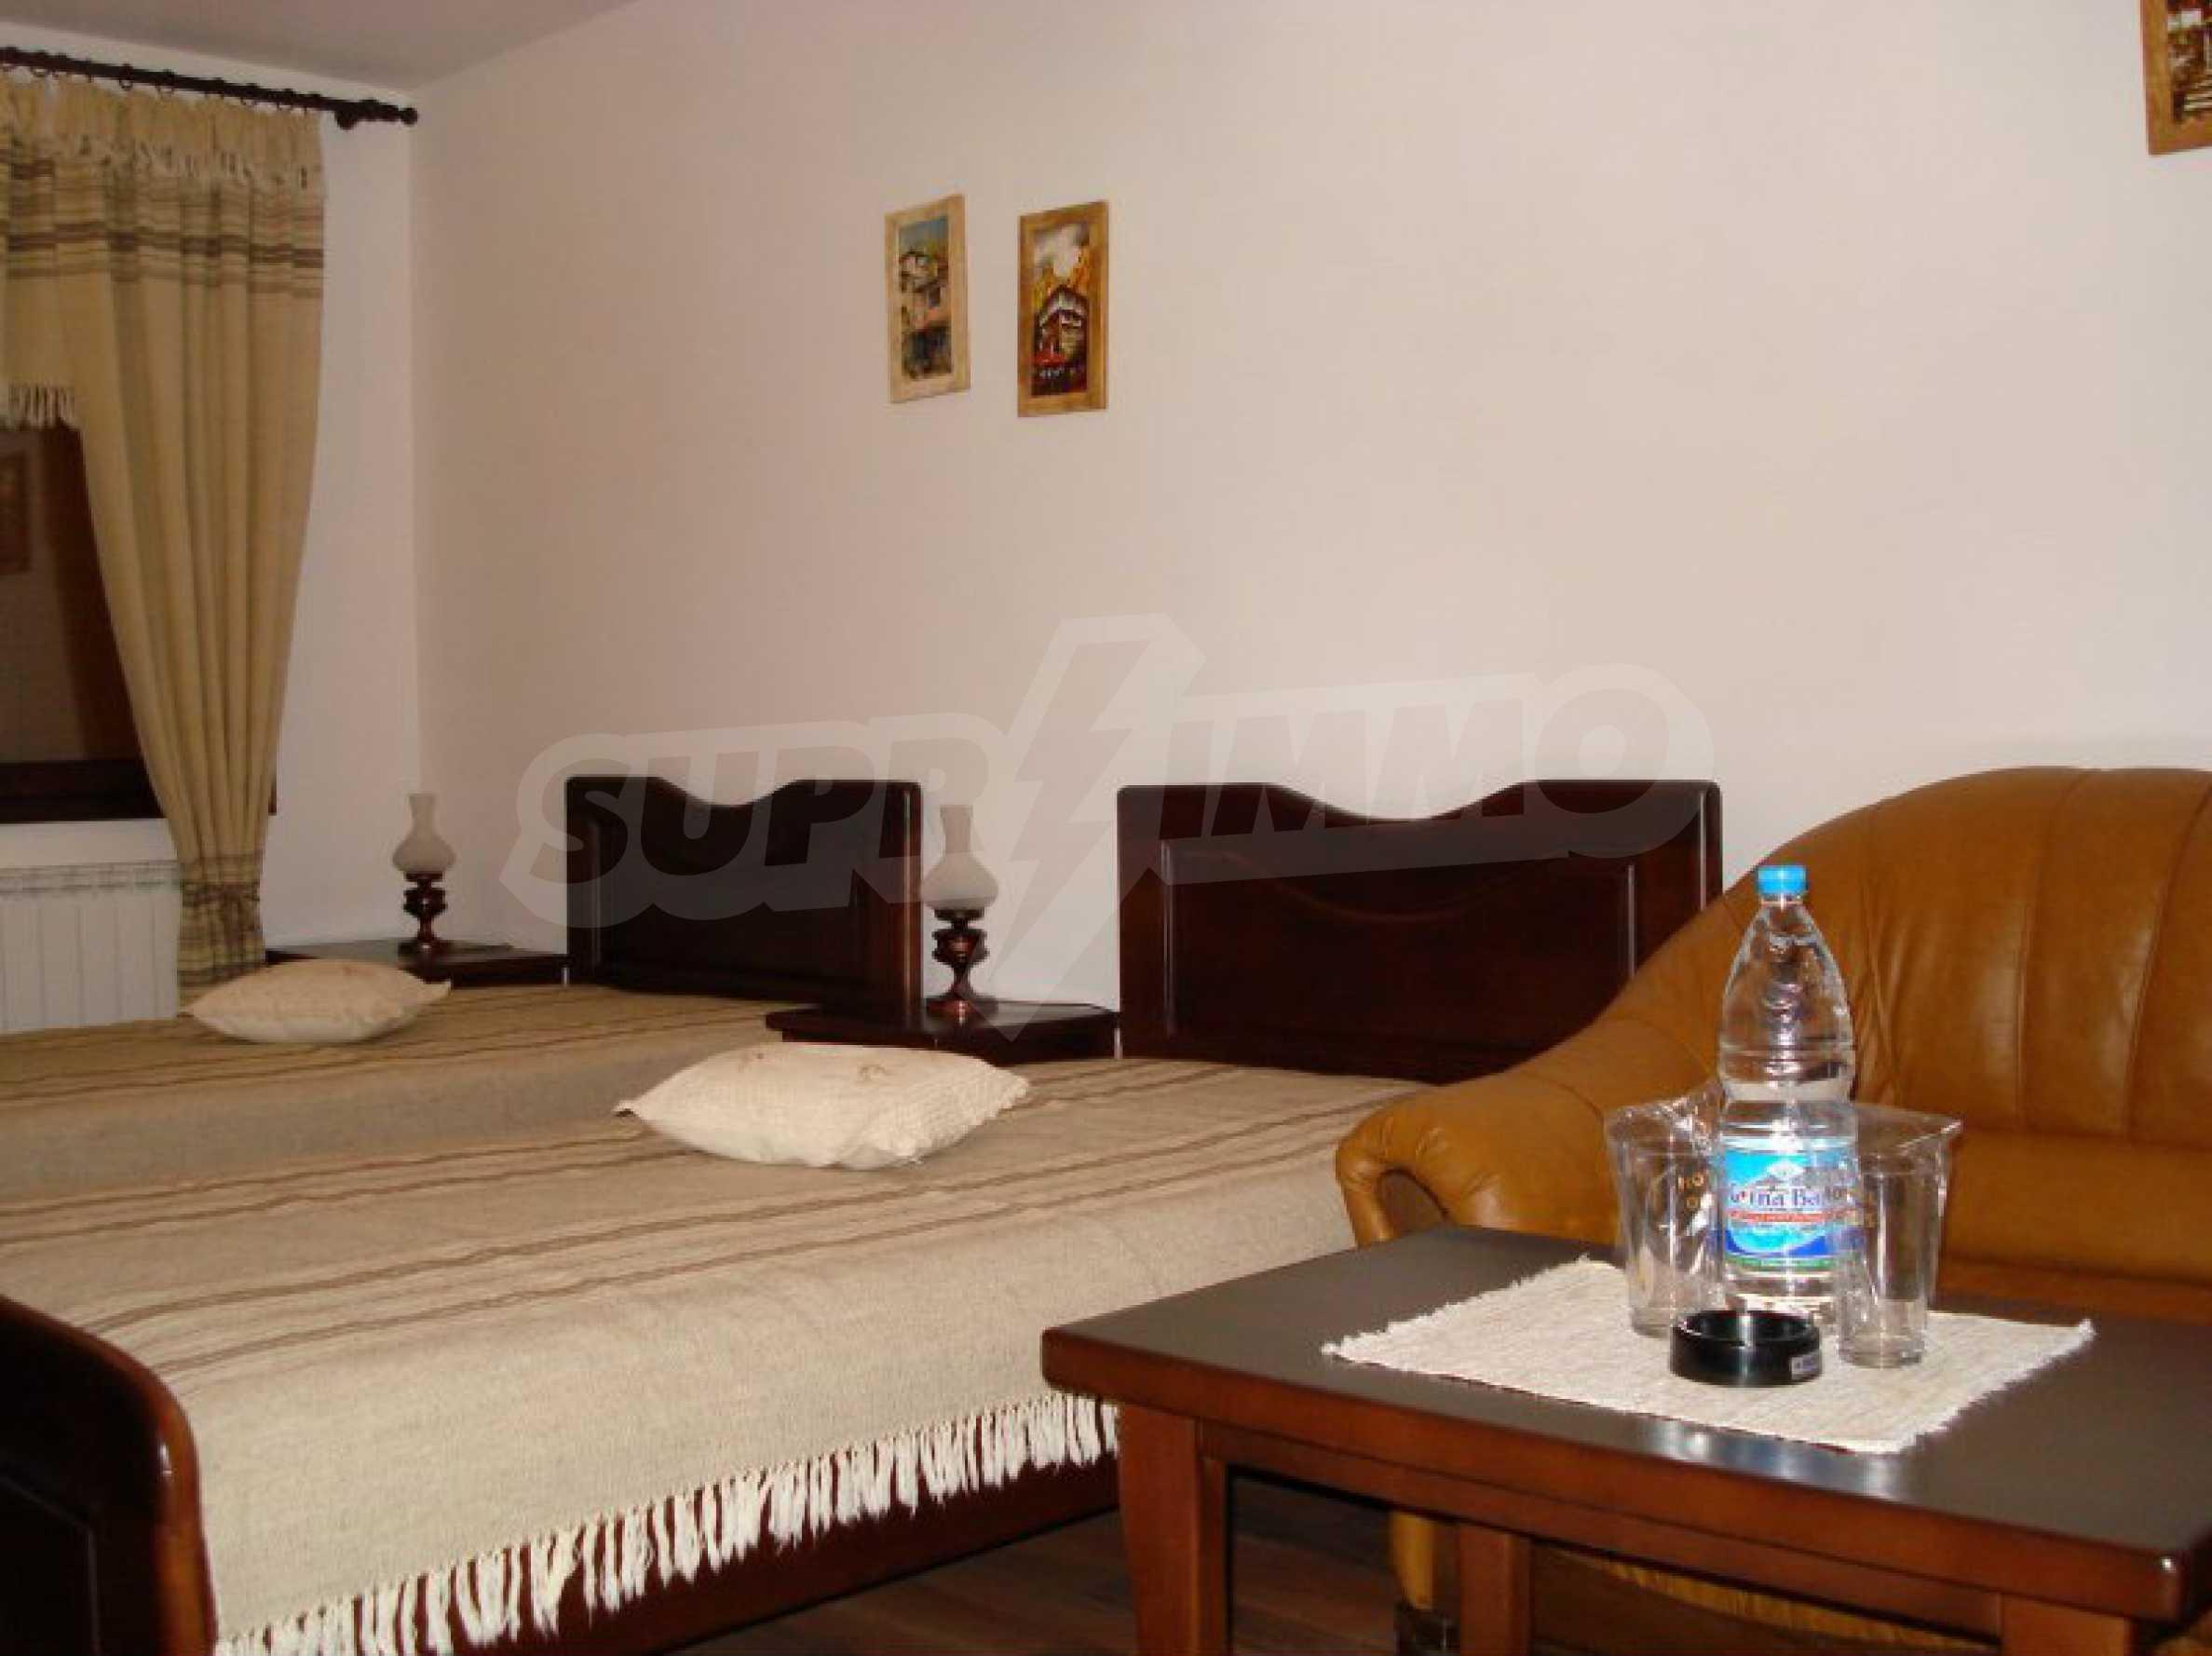 Hotelanlage mit Restaurant am Ufer des Flusses Osam in Lovech 44